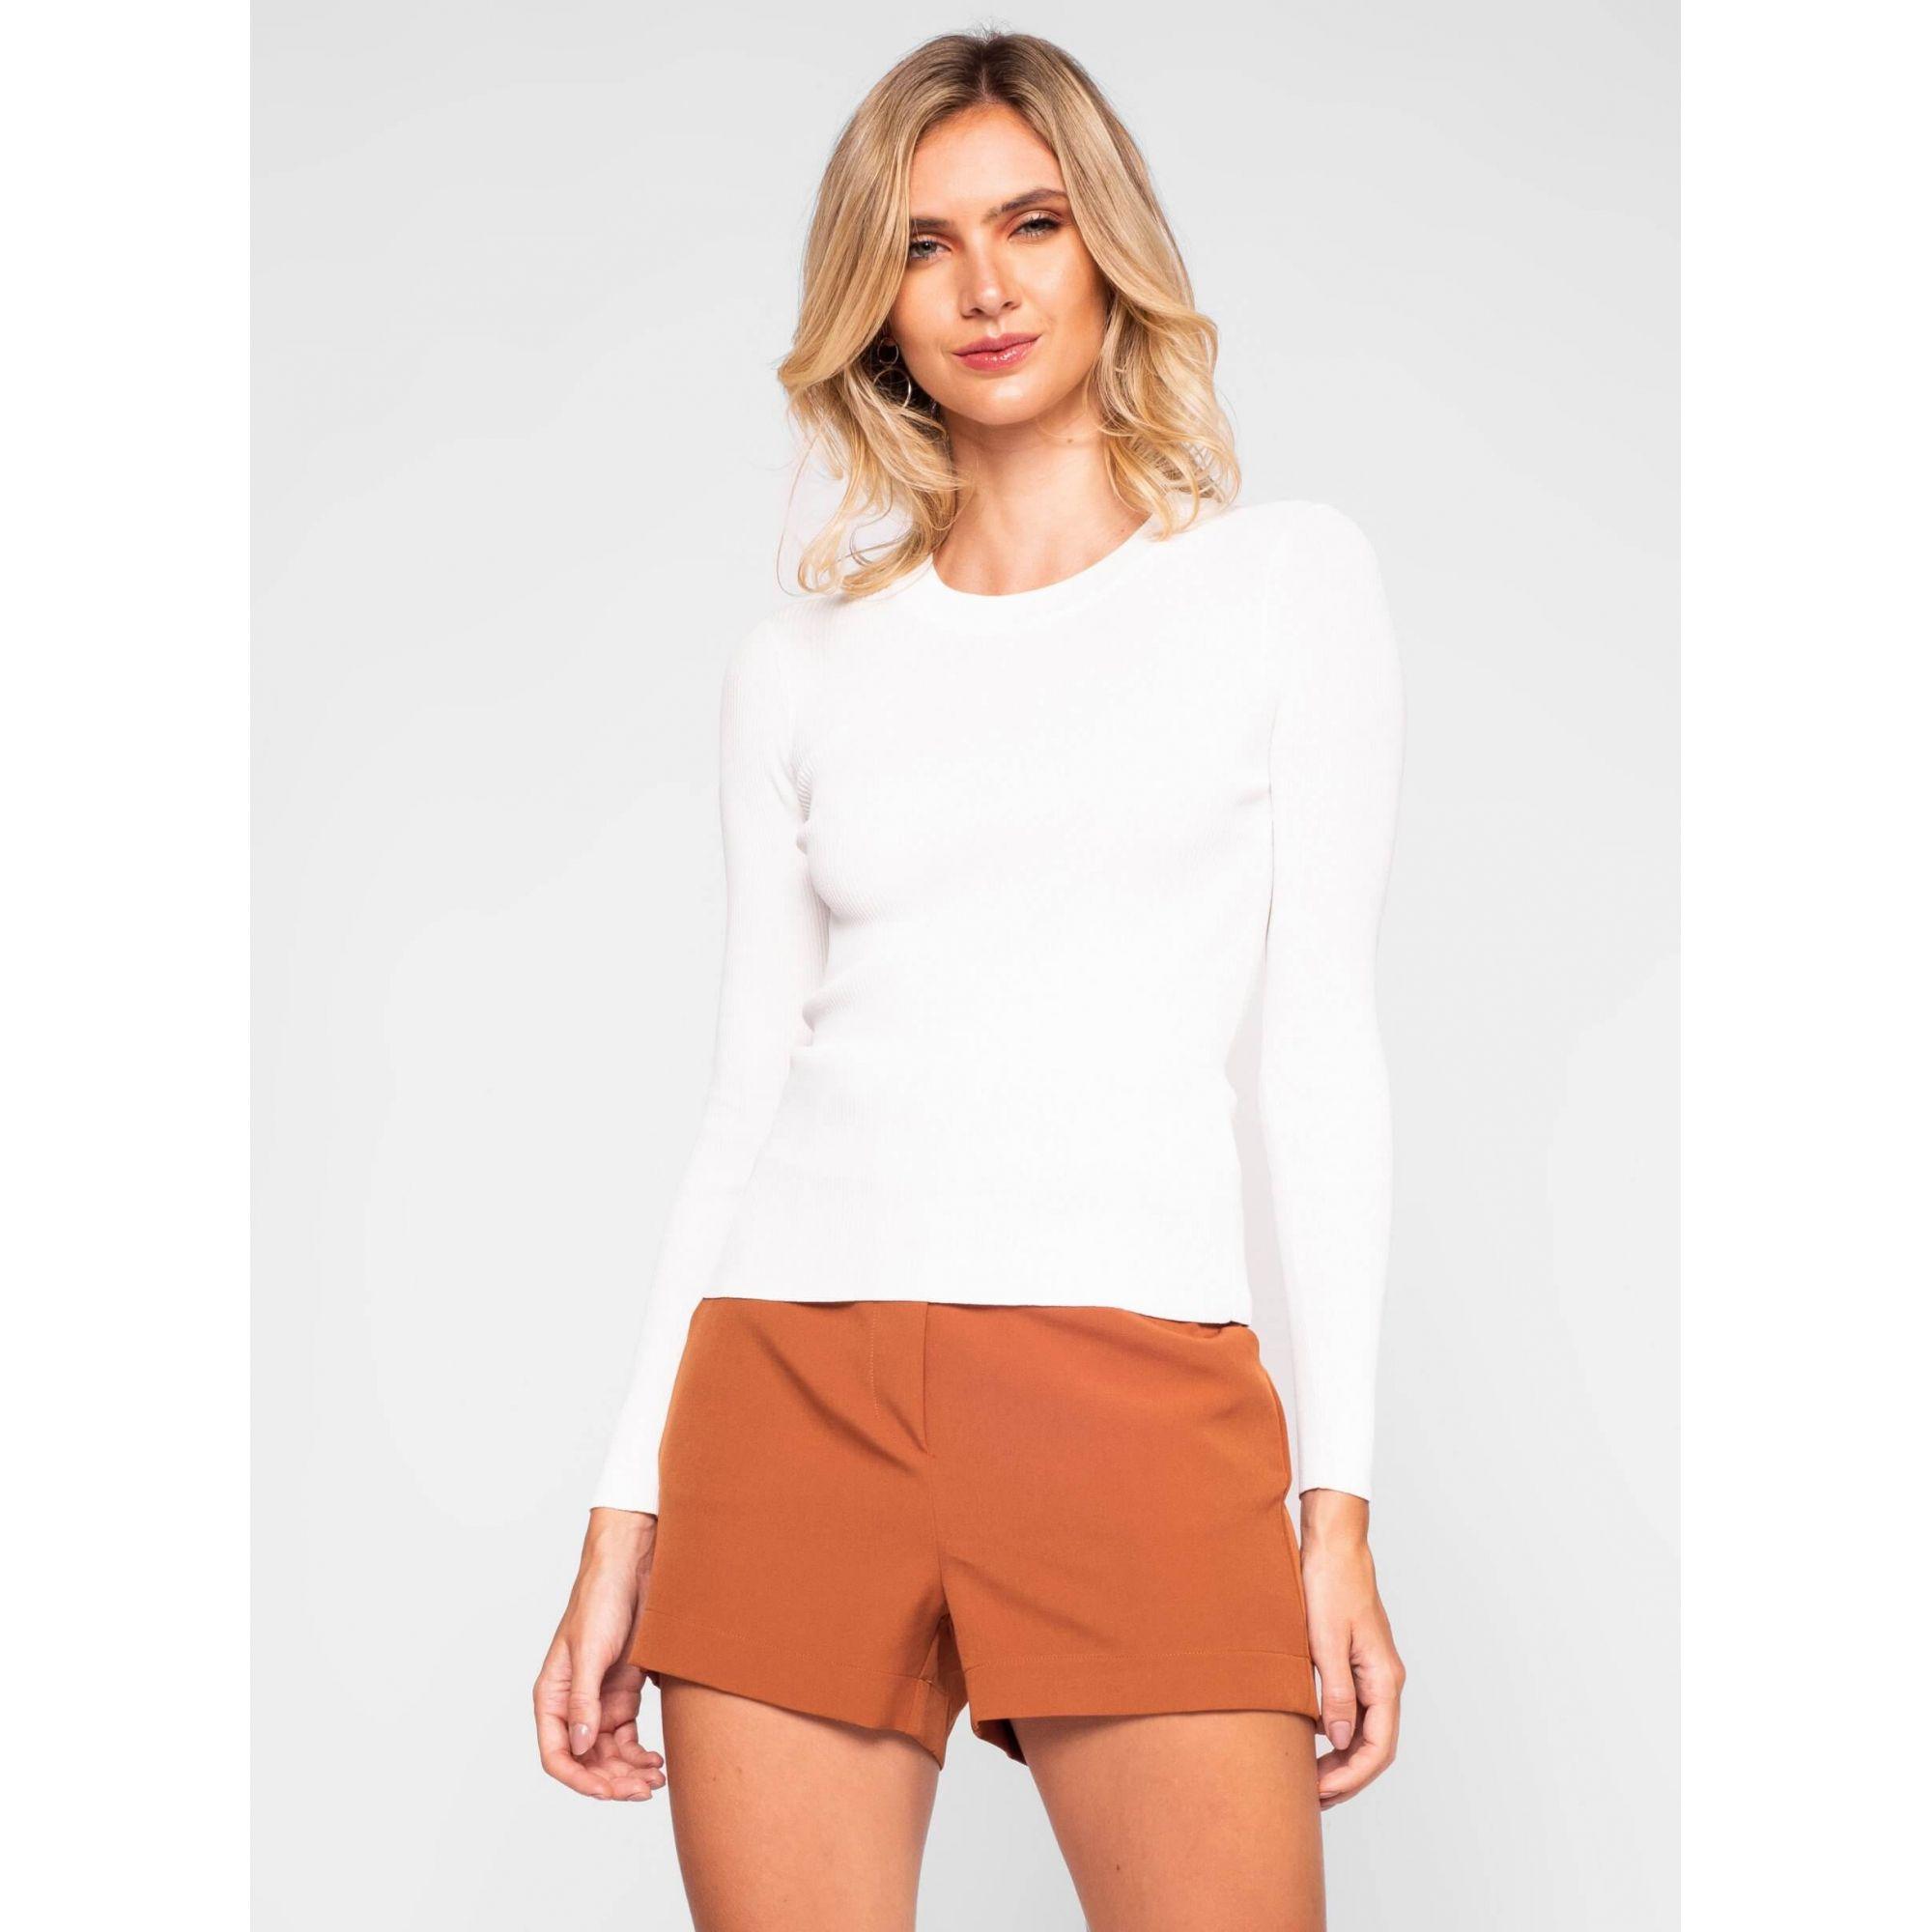 Blusa tricot básica justa decote redondo